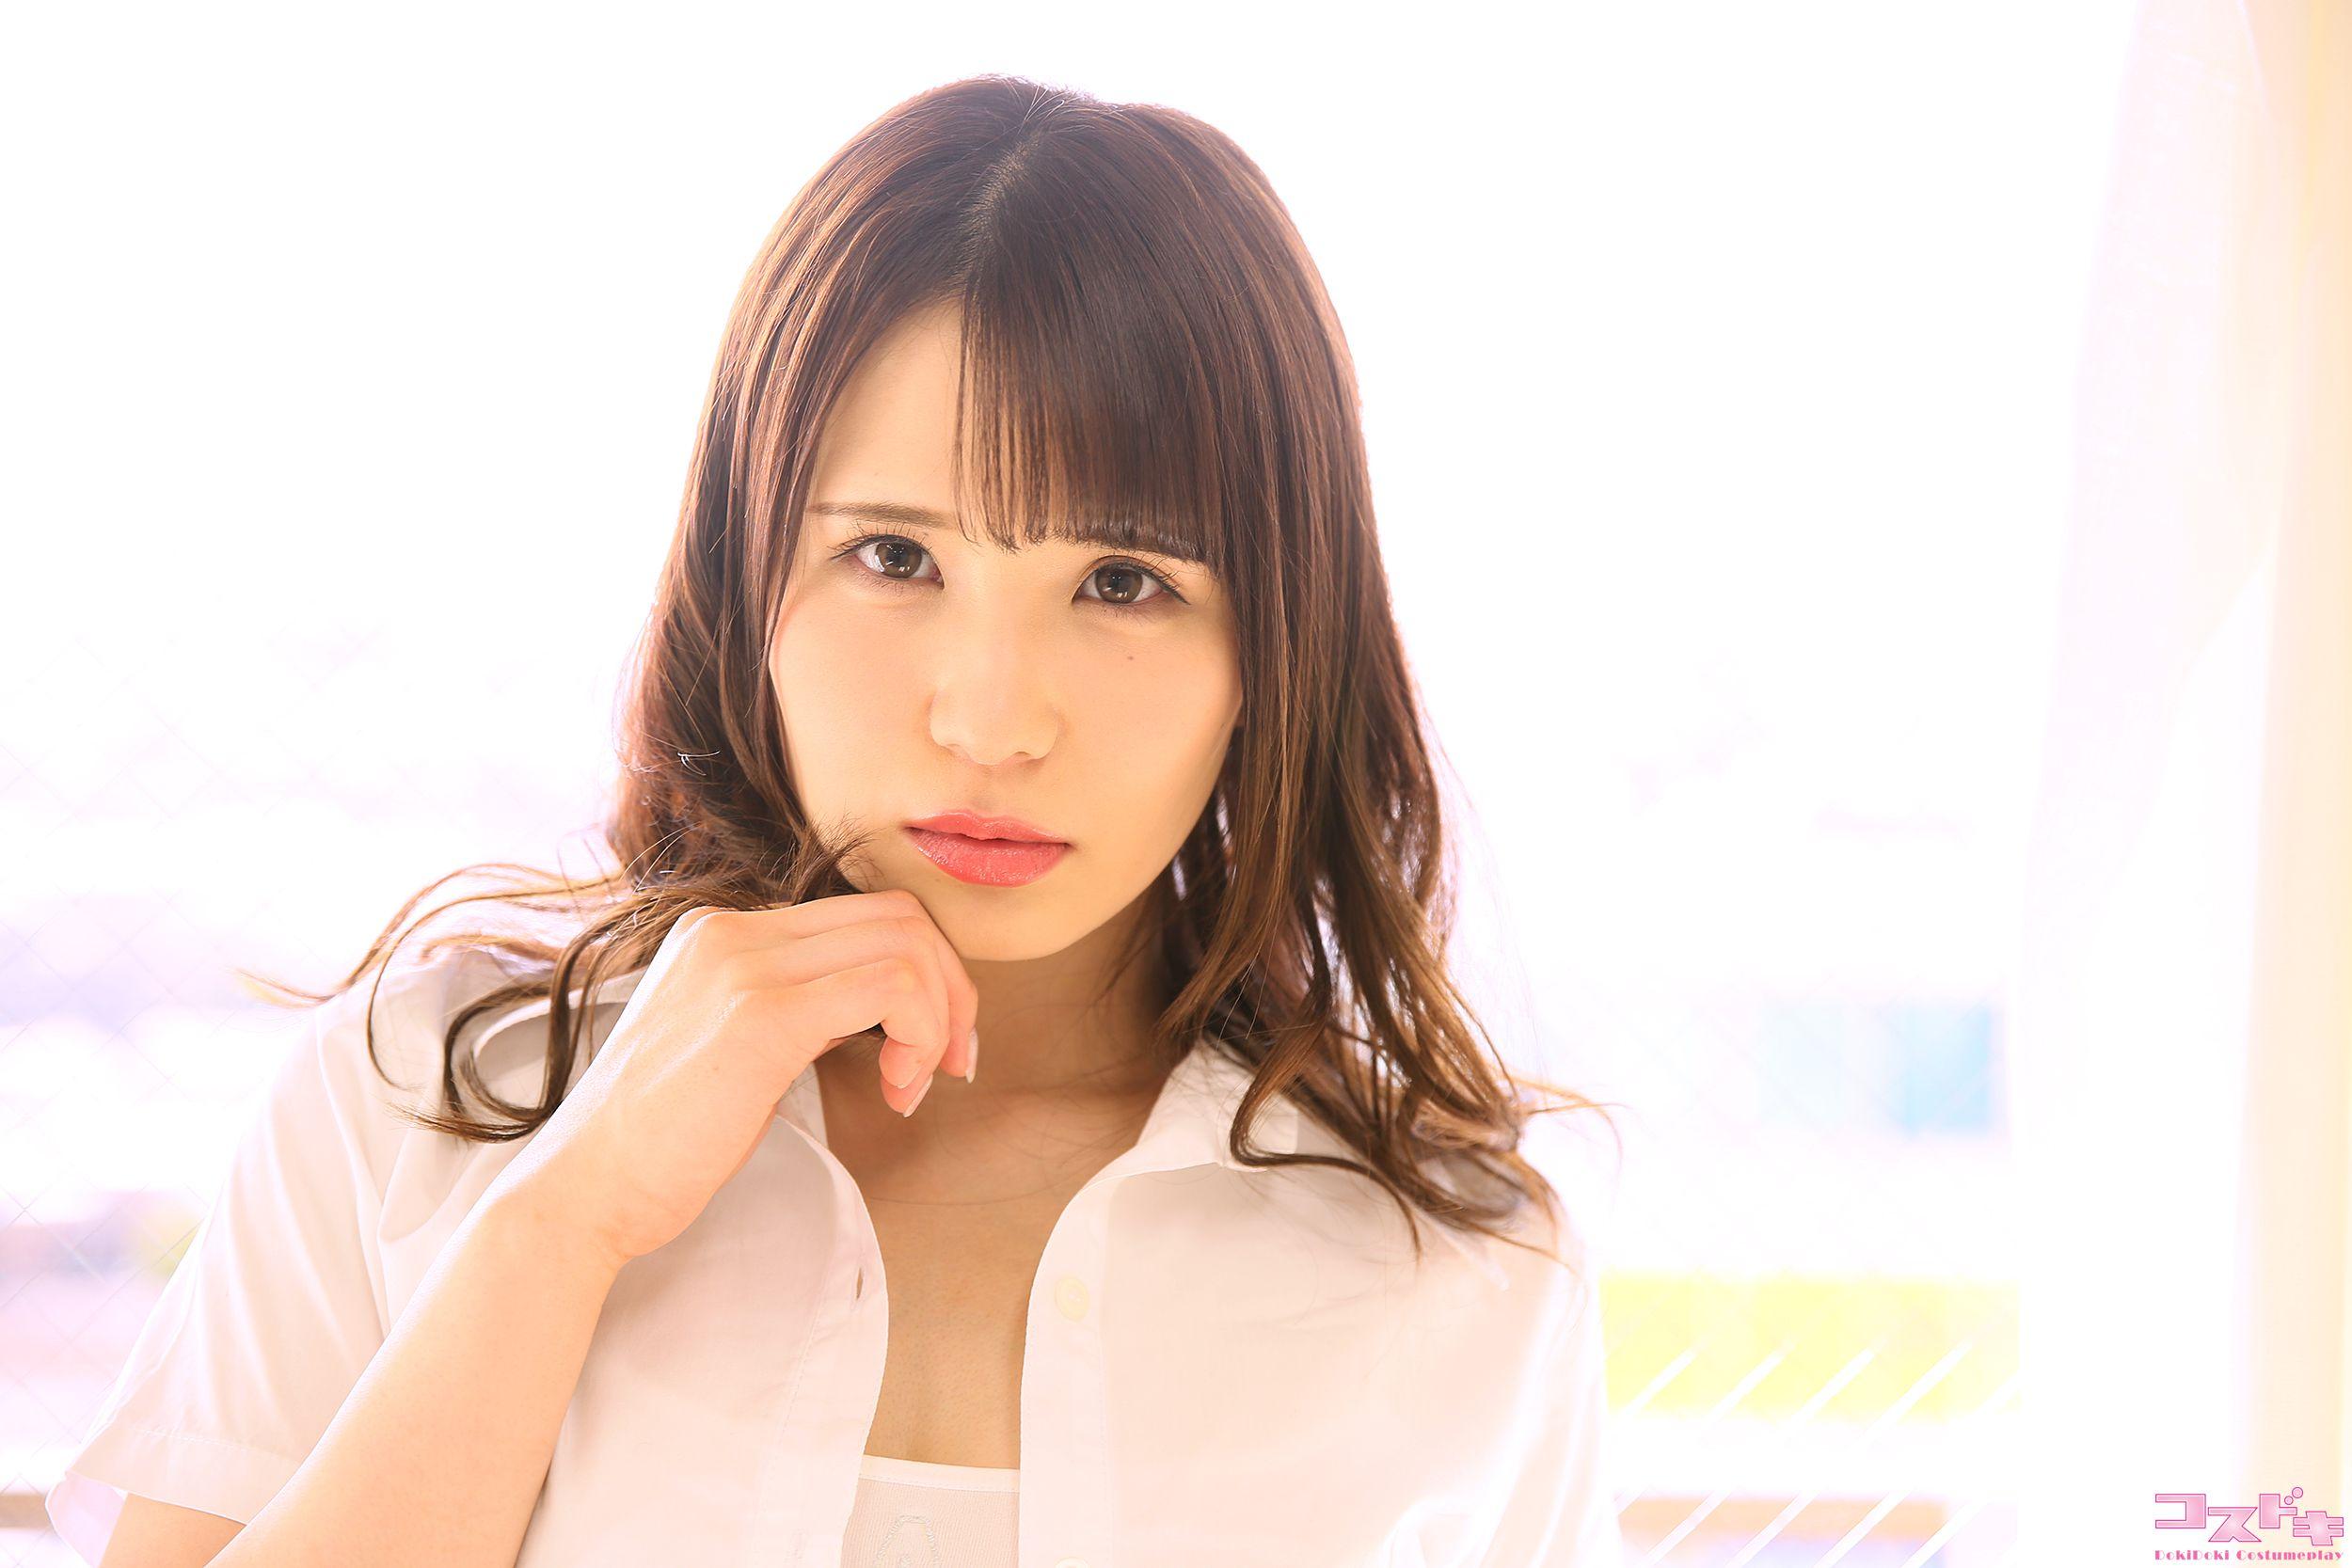 VOL.389 [Cosdoki]日本制服:河西乃爱(河西乃愛)超高清写真套图(35P)